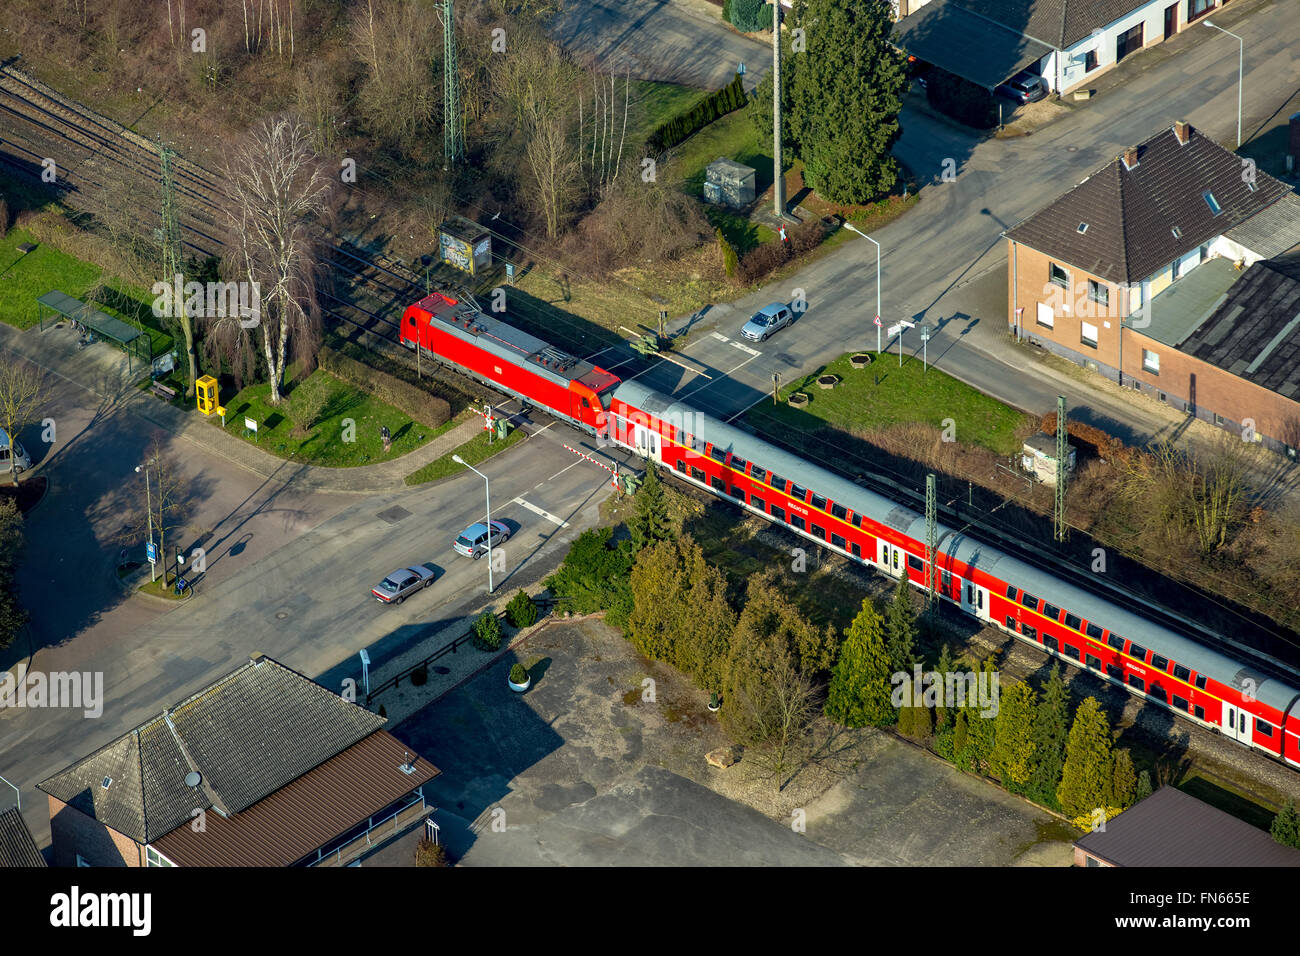 Aerial view, Empel Rees with railway line, Betuwelijn, Betuweroute, Rees, Lower Rhine region, North Rhine Westphalia, - Stock Image